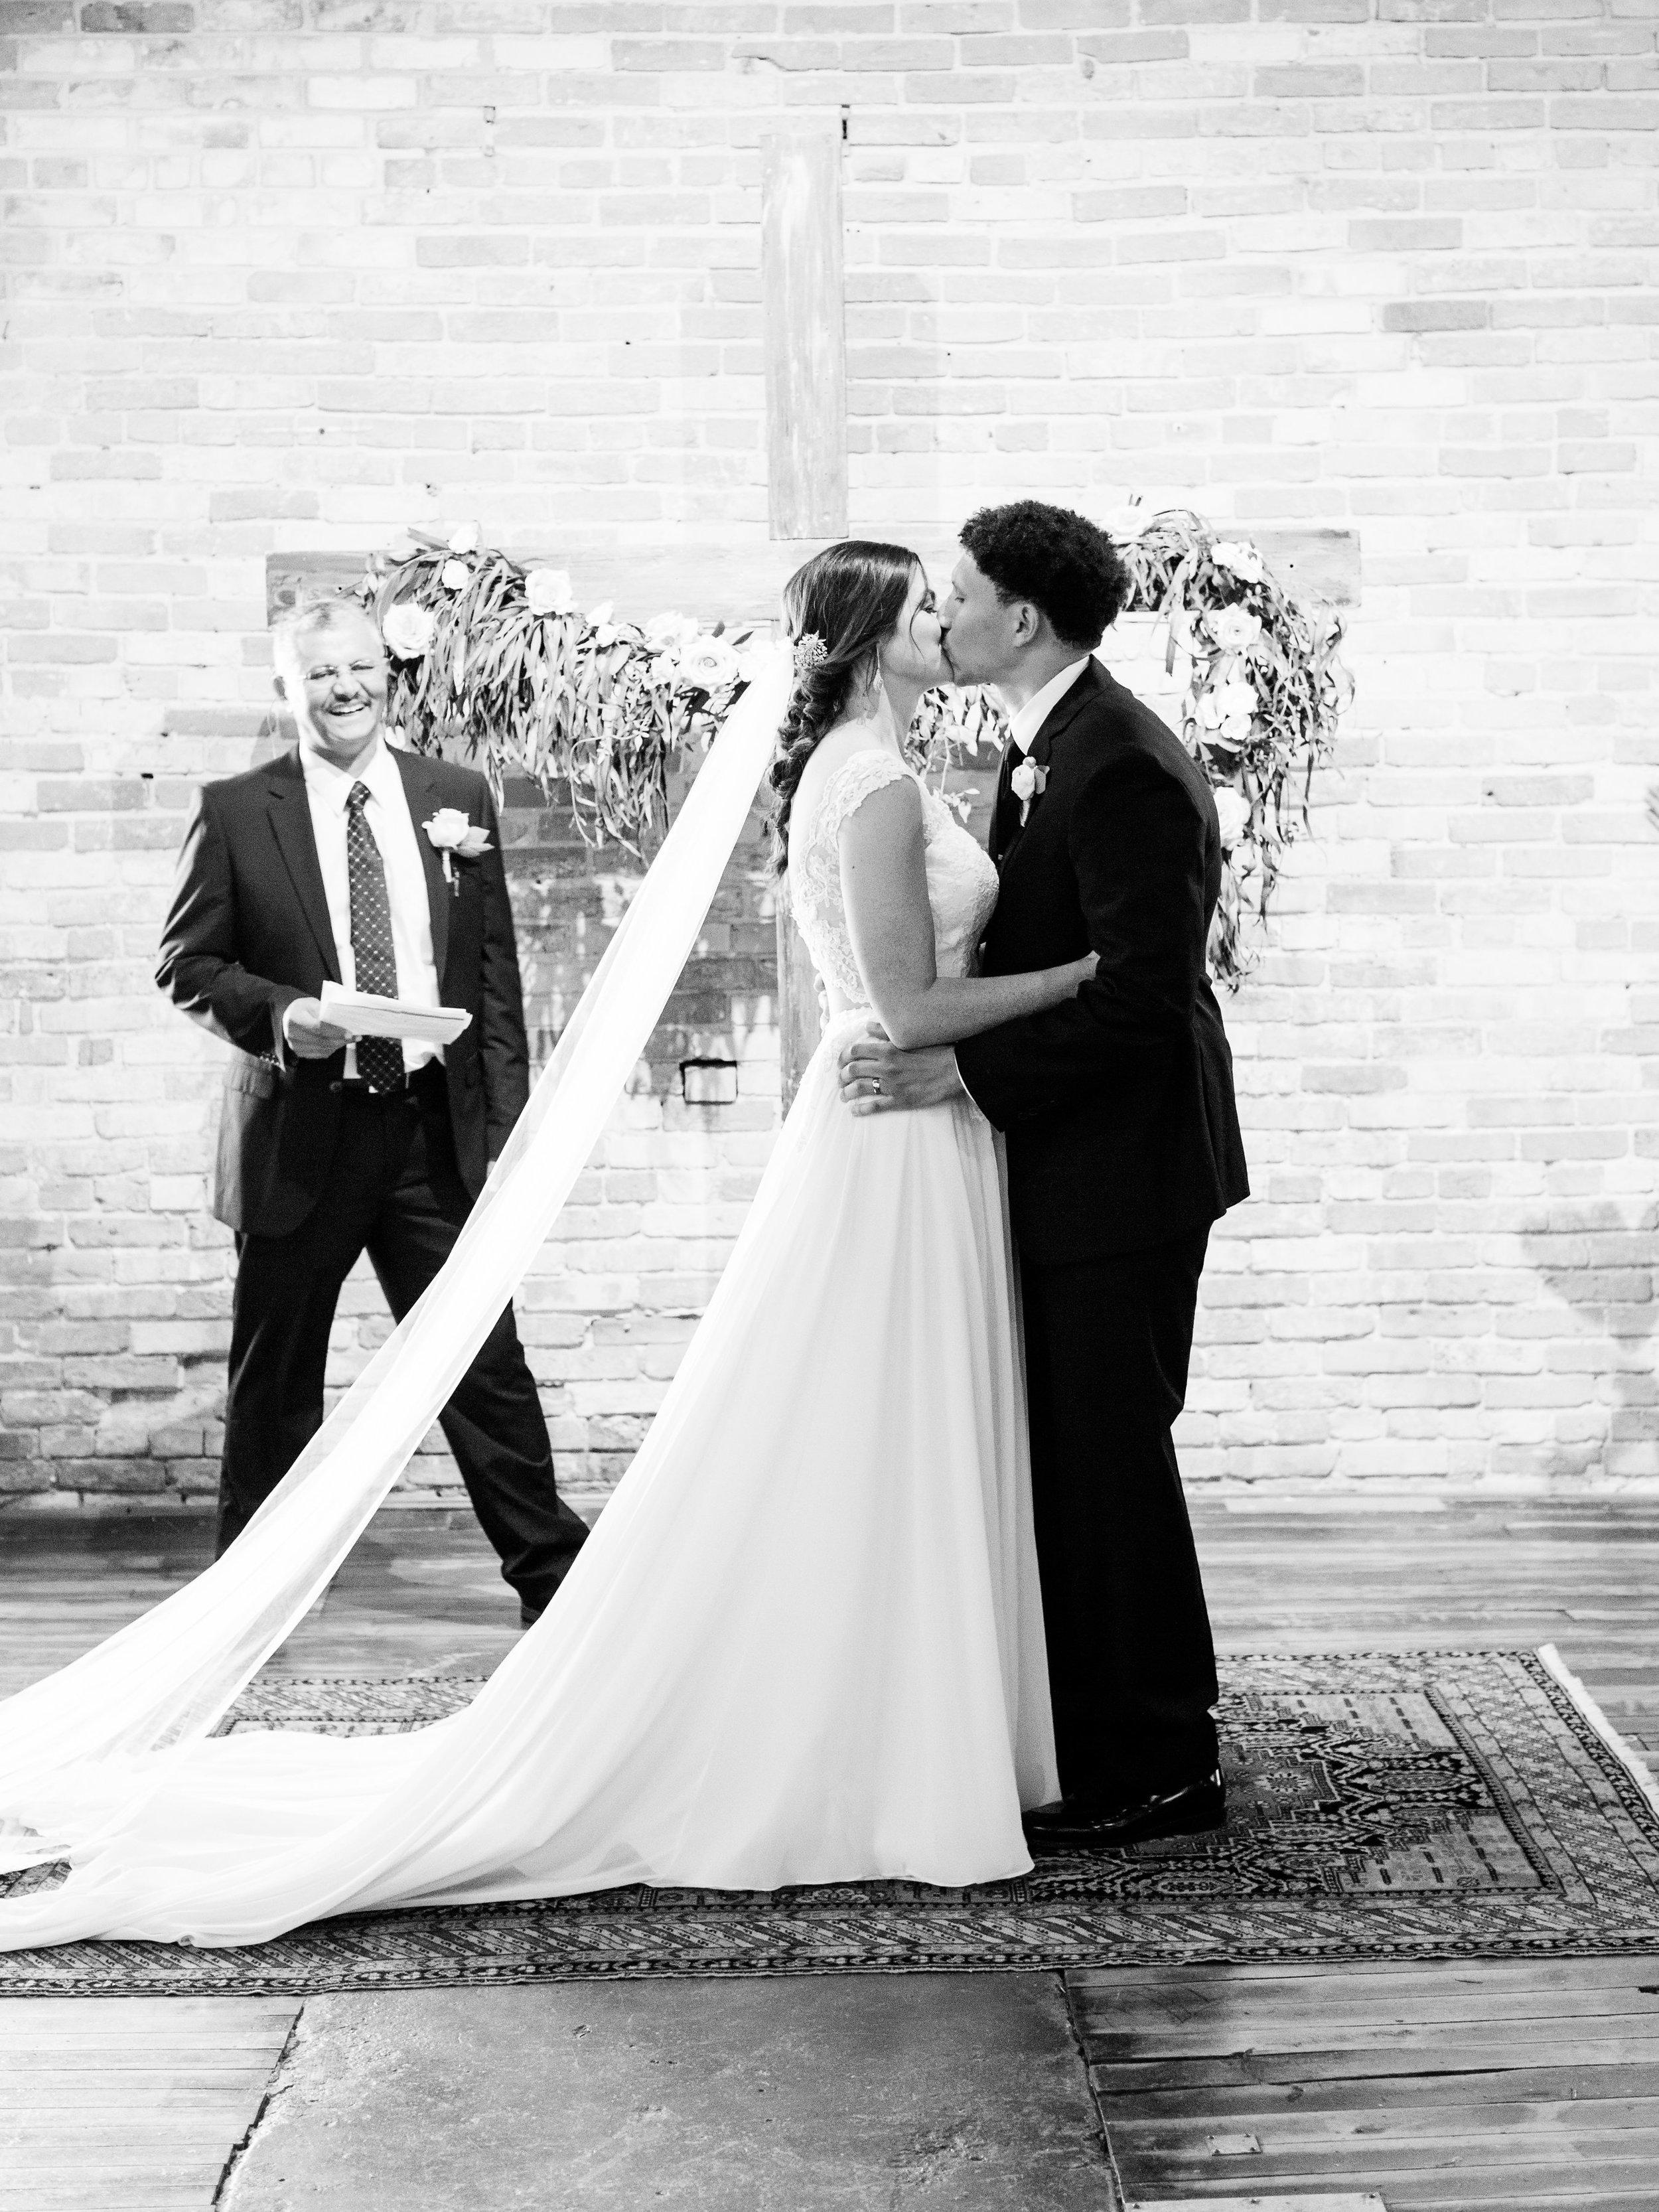 Julius+Wedding+Ceremony-115.jpg